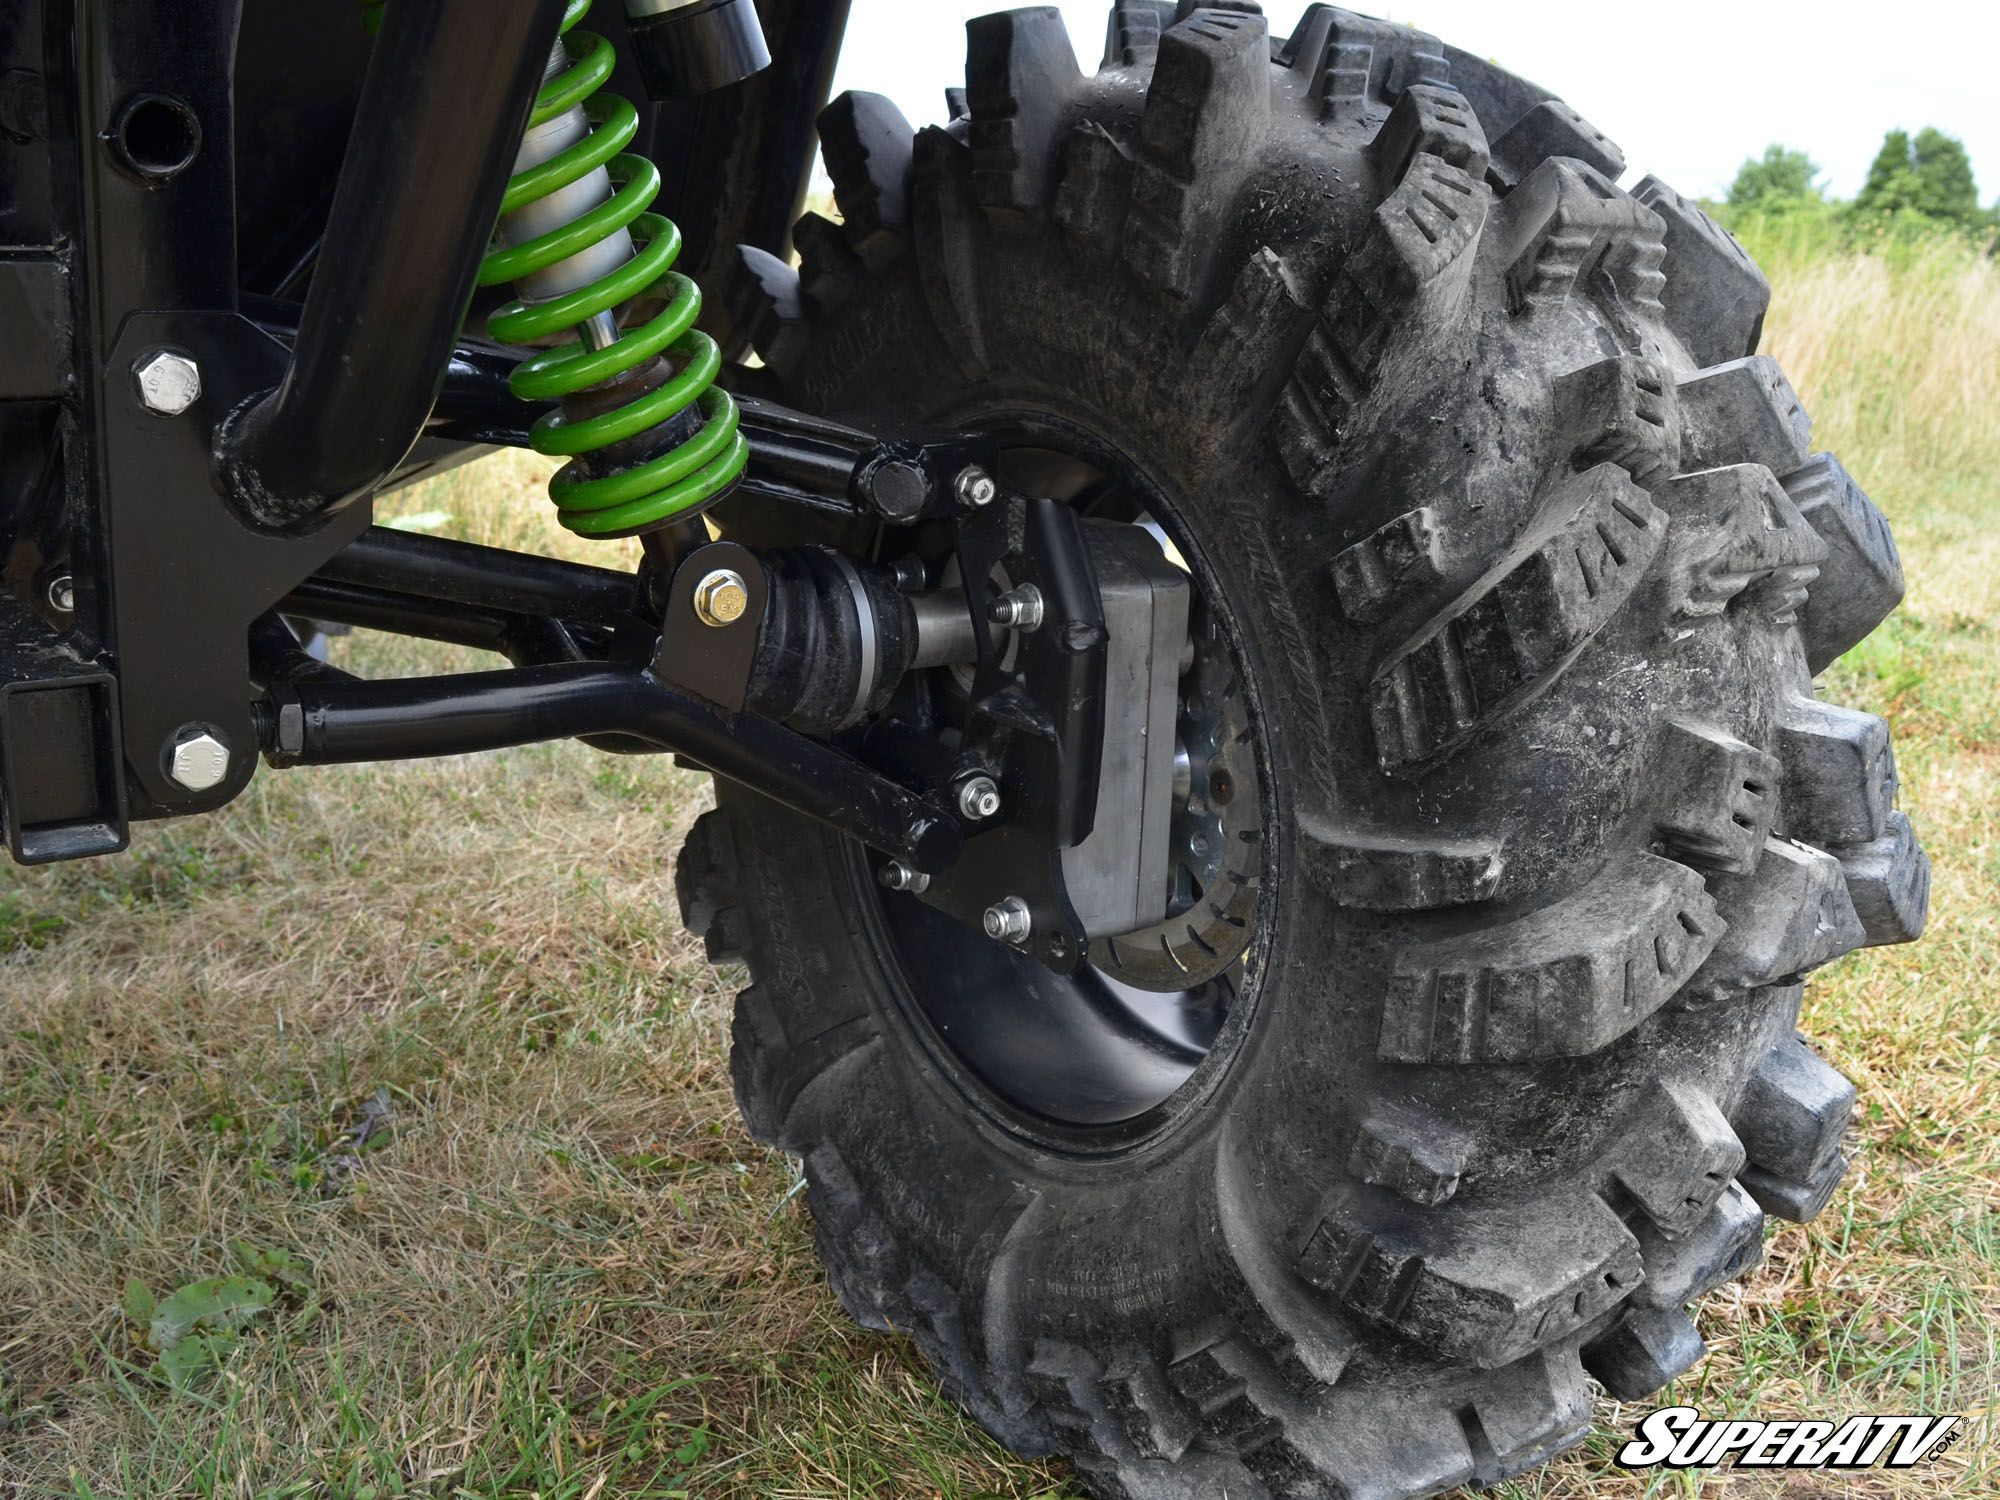 Super Atv 4 Inch Portal Gear Lift For Kawasaki Teryx 2011 Wiring Diagram